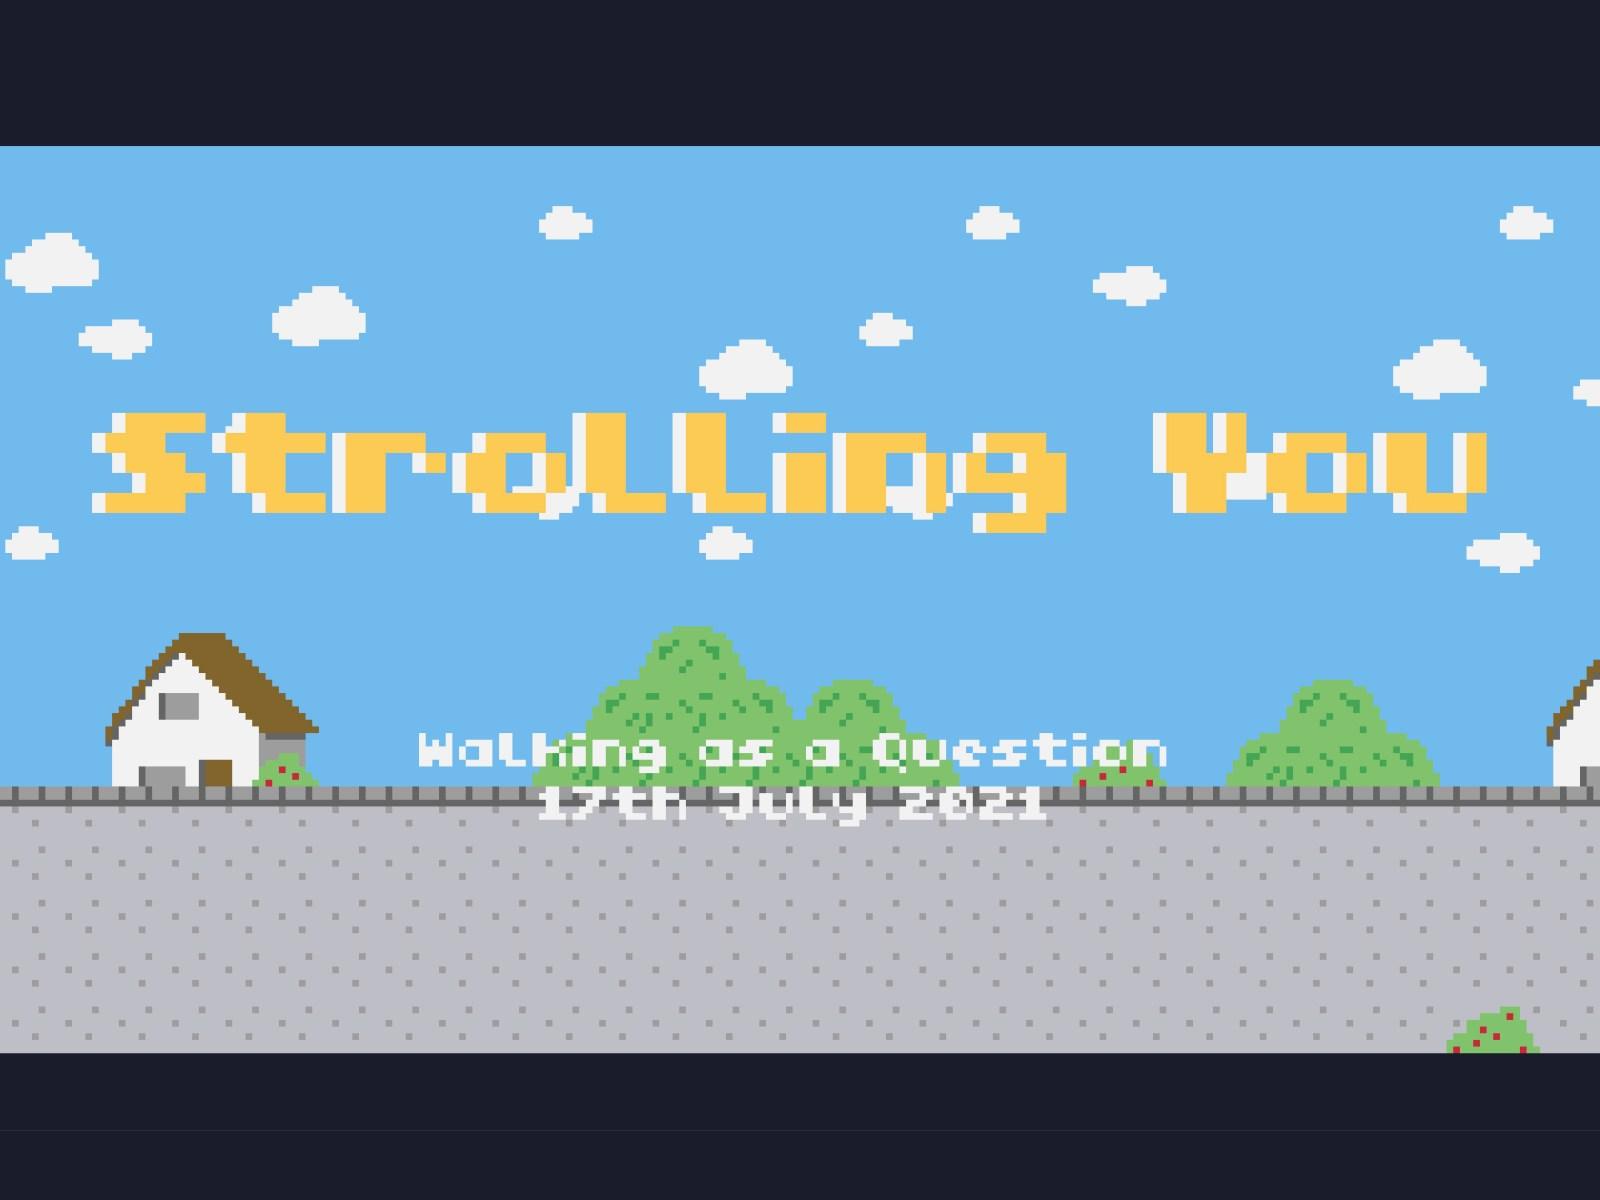 Strolling_You